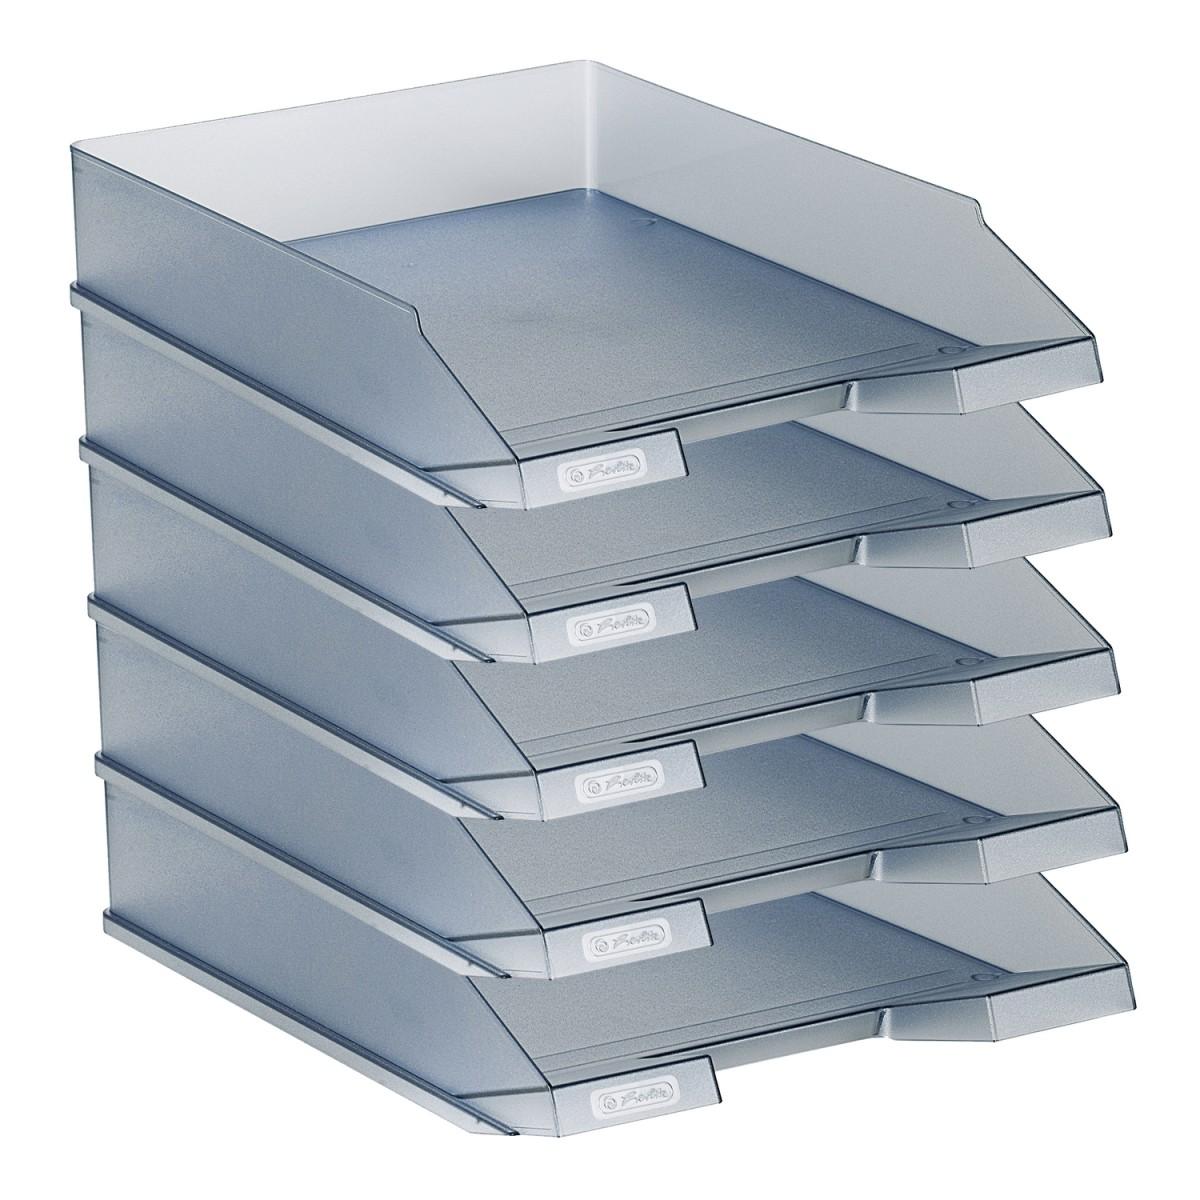 herlitz ablagekorb a4 aus kunststoff transluzent grau 5 st ck. Black Bedroom Furniture Sets. Home Design Ideas